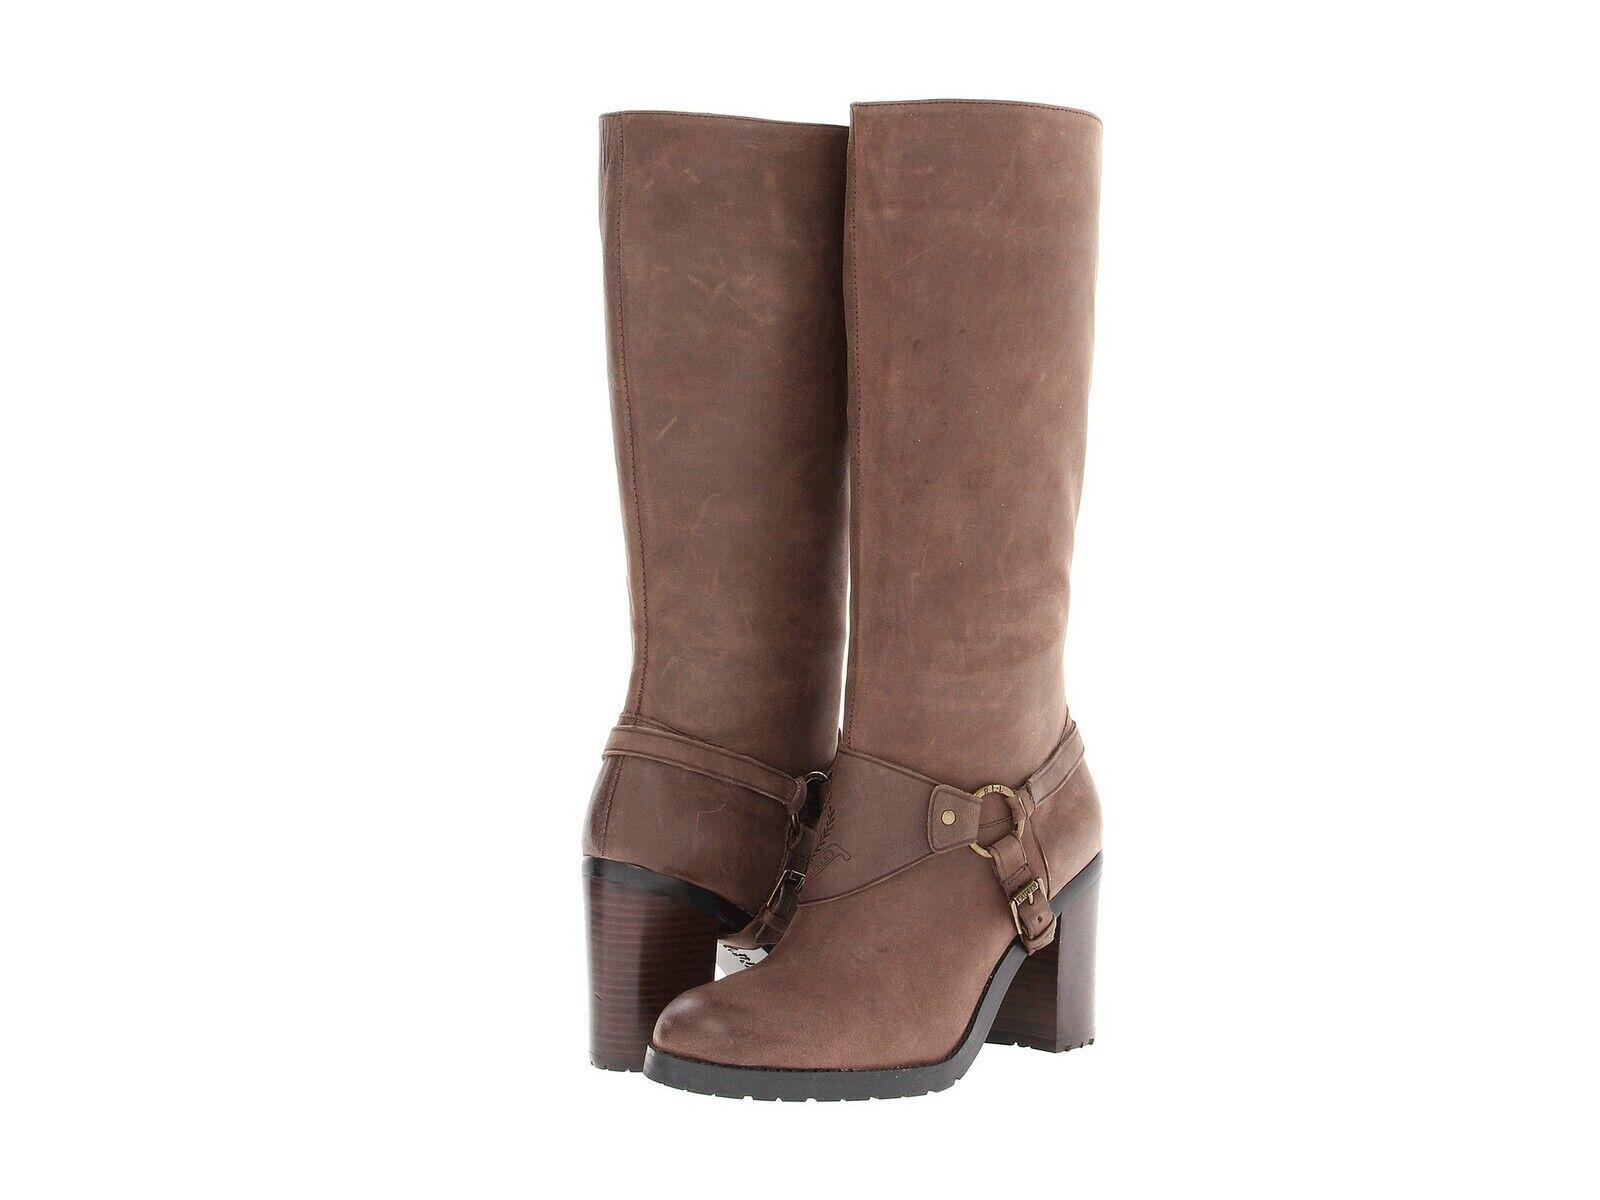 69% OFF RALPH LAUREN Delsa Boots Dark Brown Burnished Suede size 9, 9.5  249